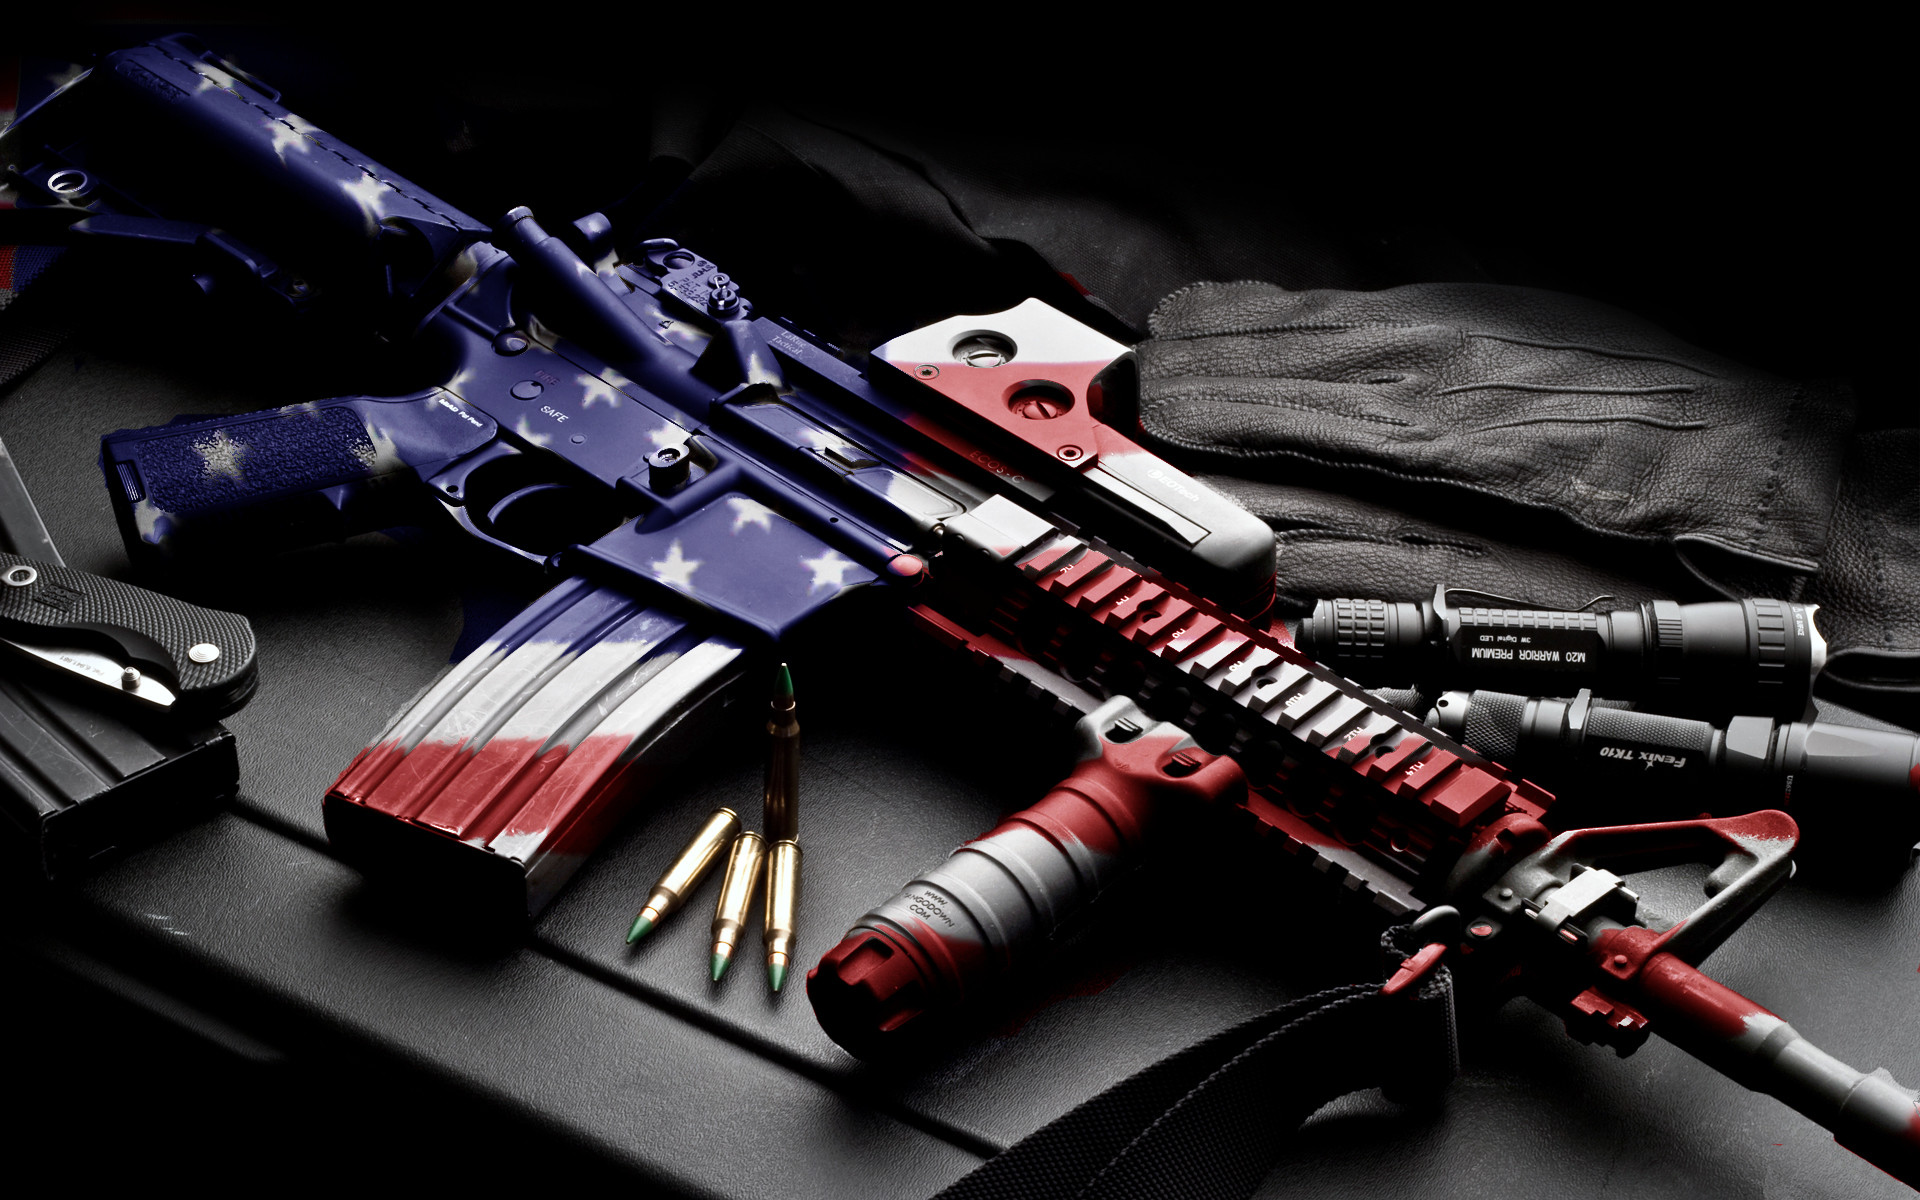 usa america guns mech machine bullet ammo ammuntion flag wallpaper .